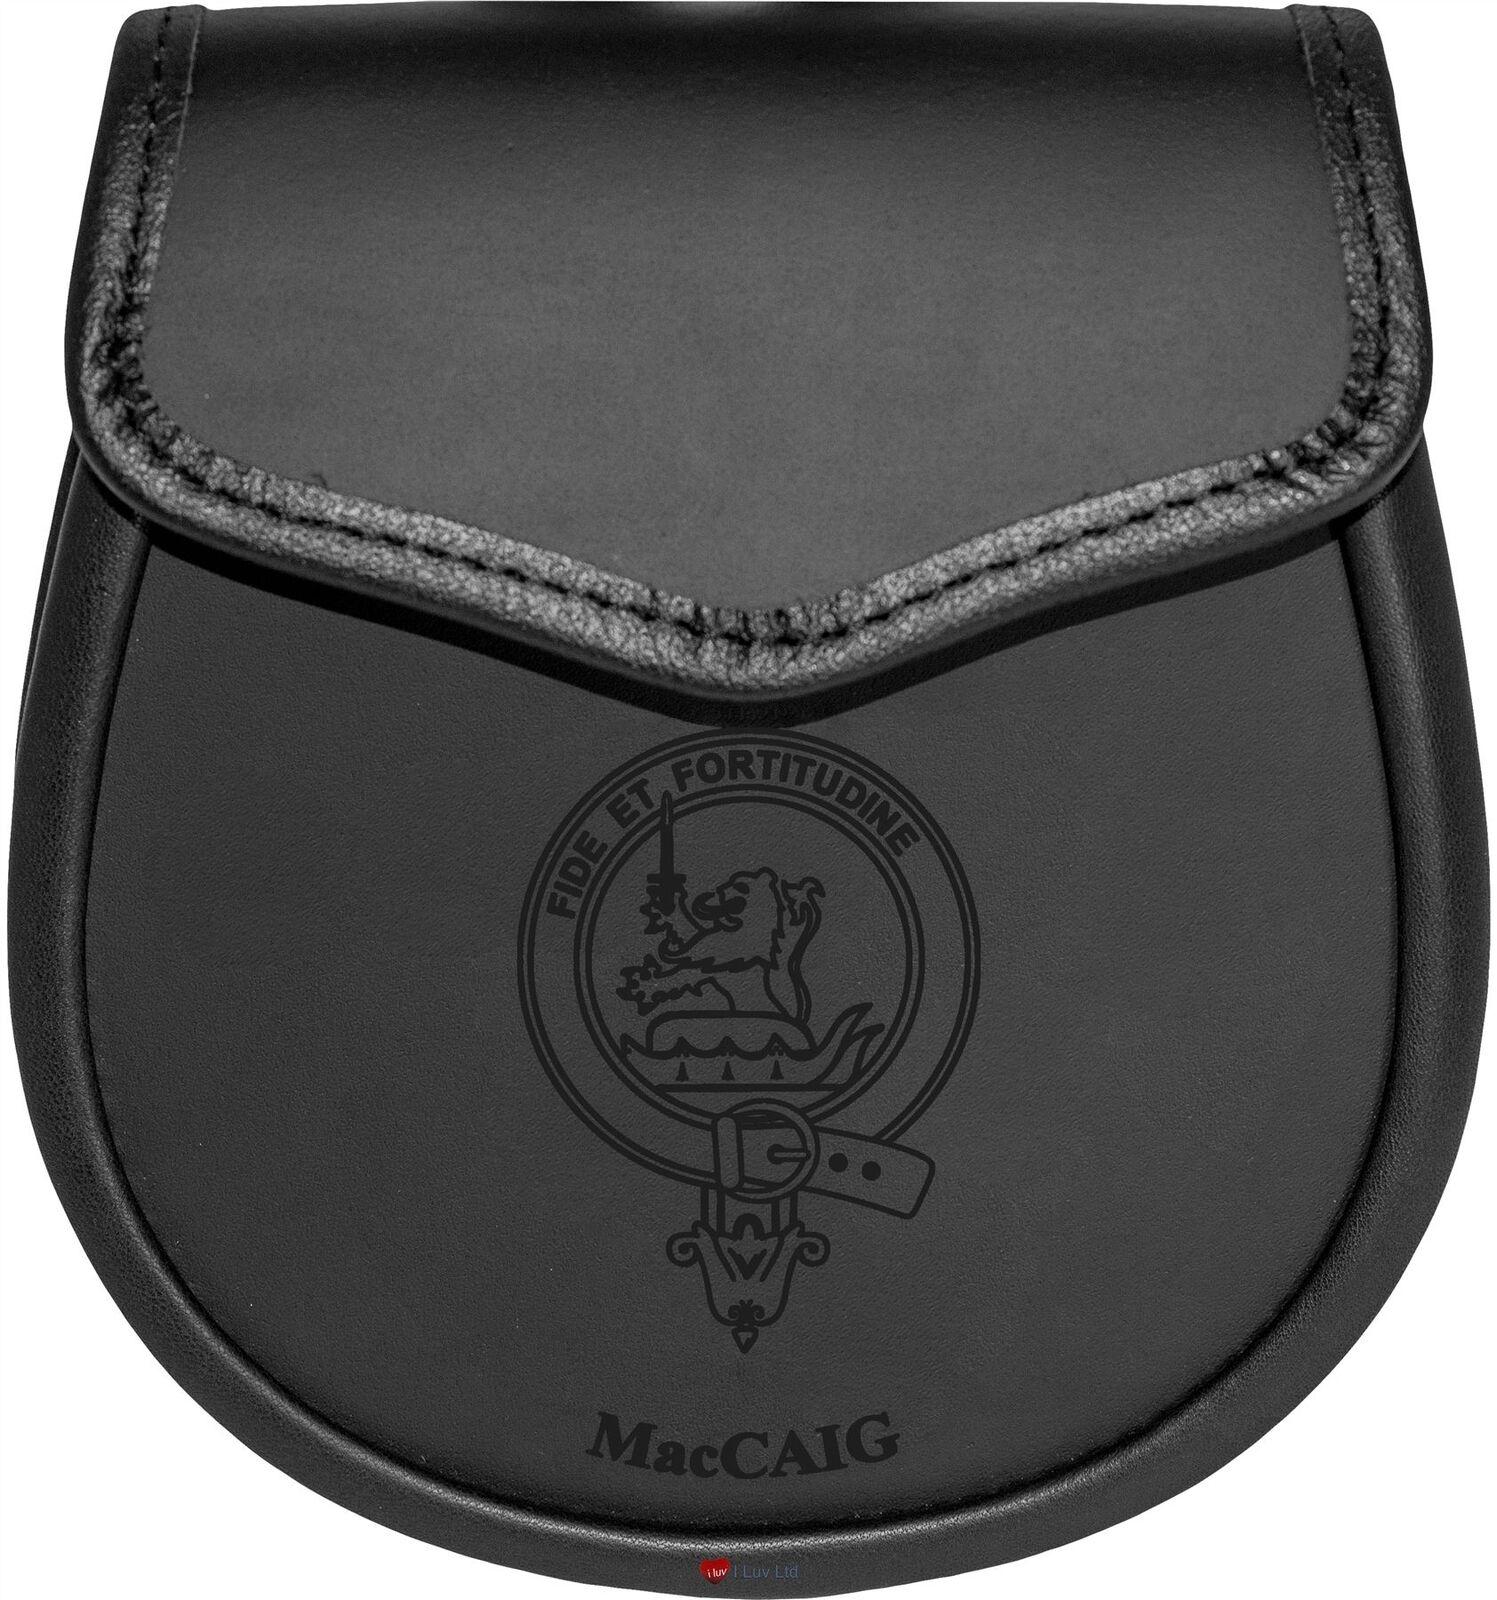 MacCaig Leather Day Sporran Scottish Clan Crest